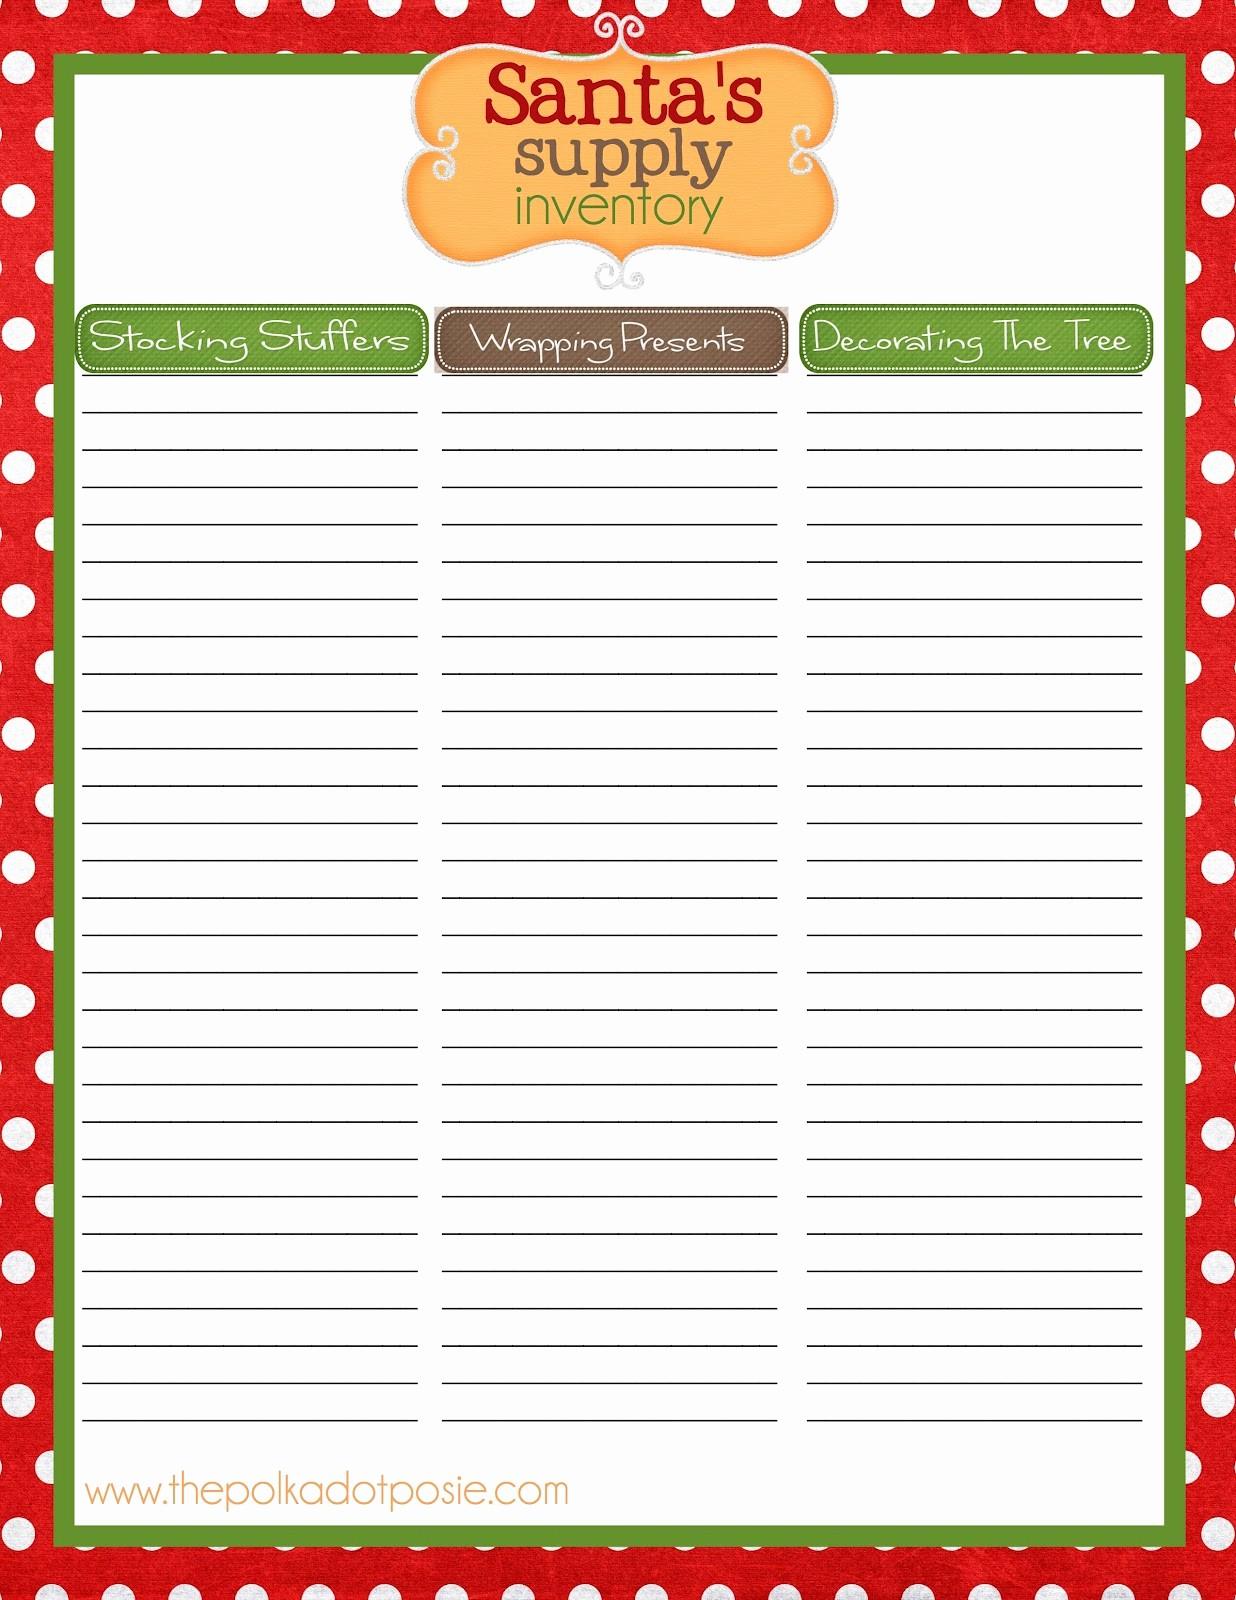 Secret Santa Sign Up List New Christmas List Templates Portablegasgrillweber